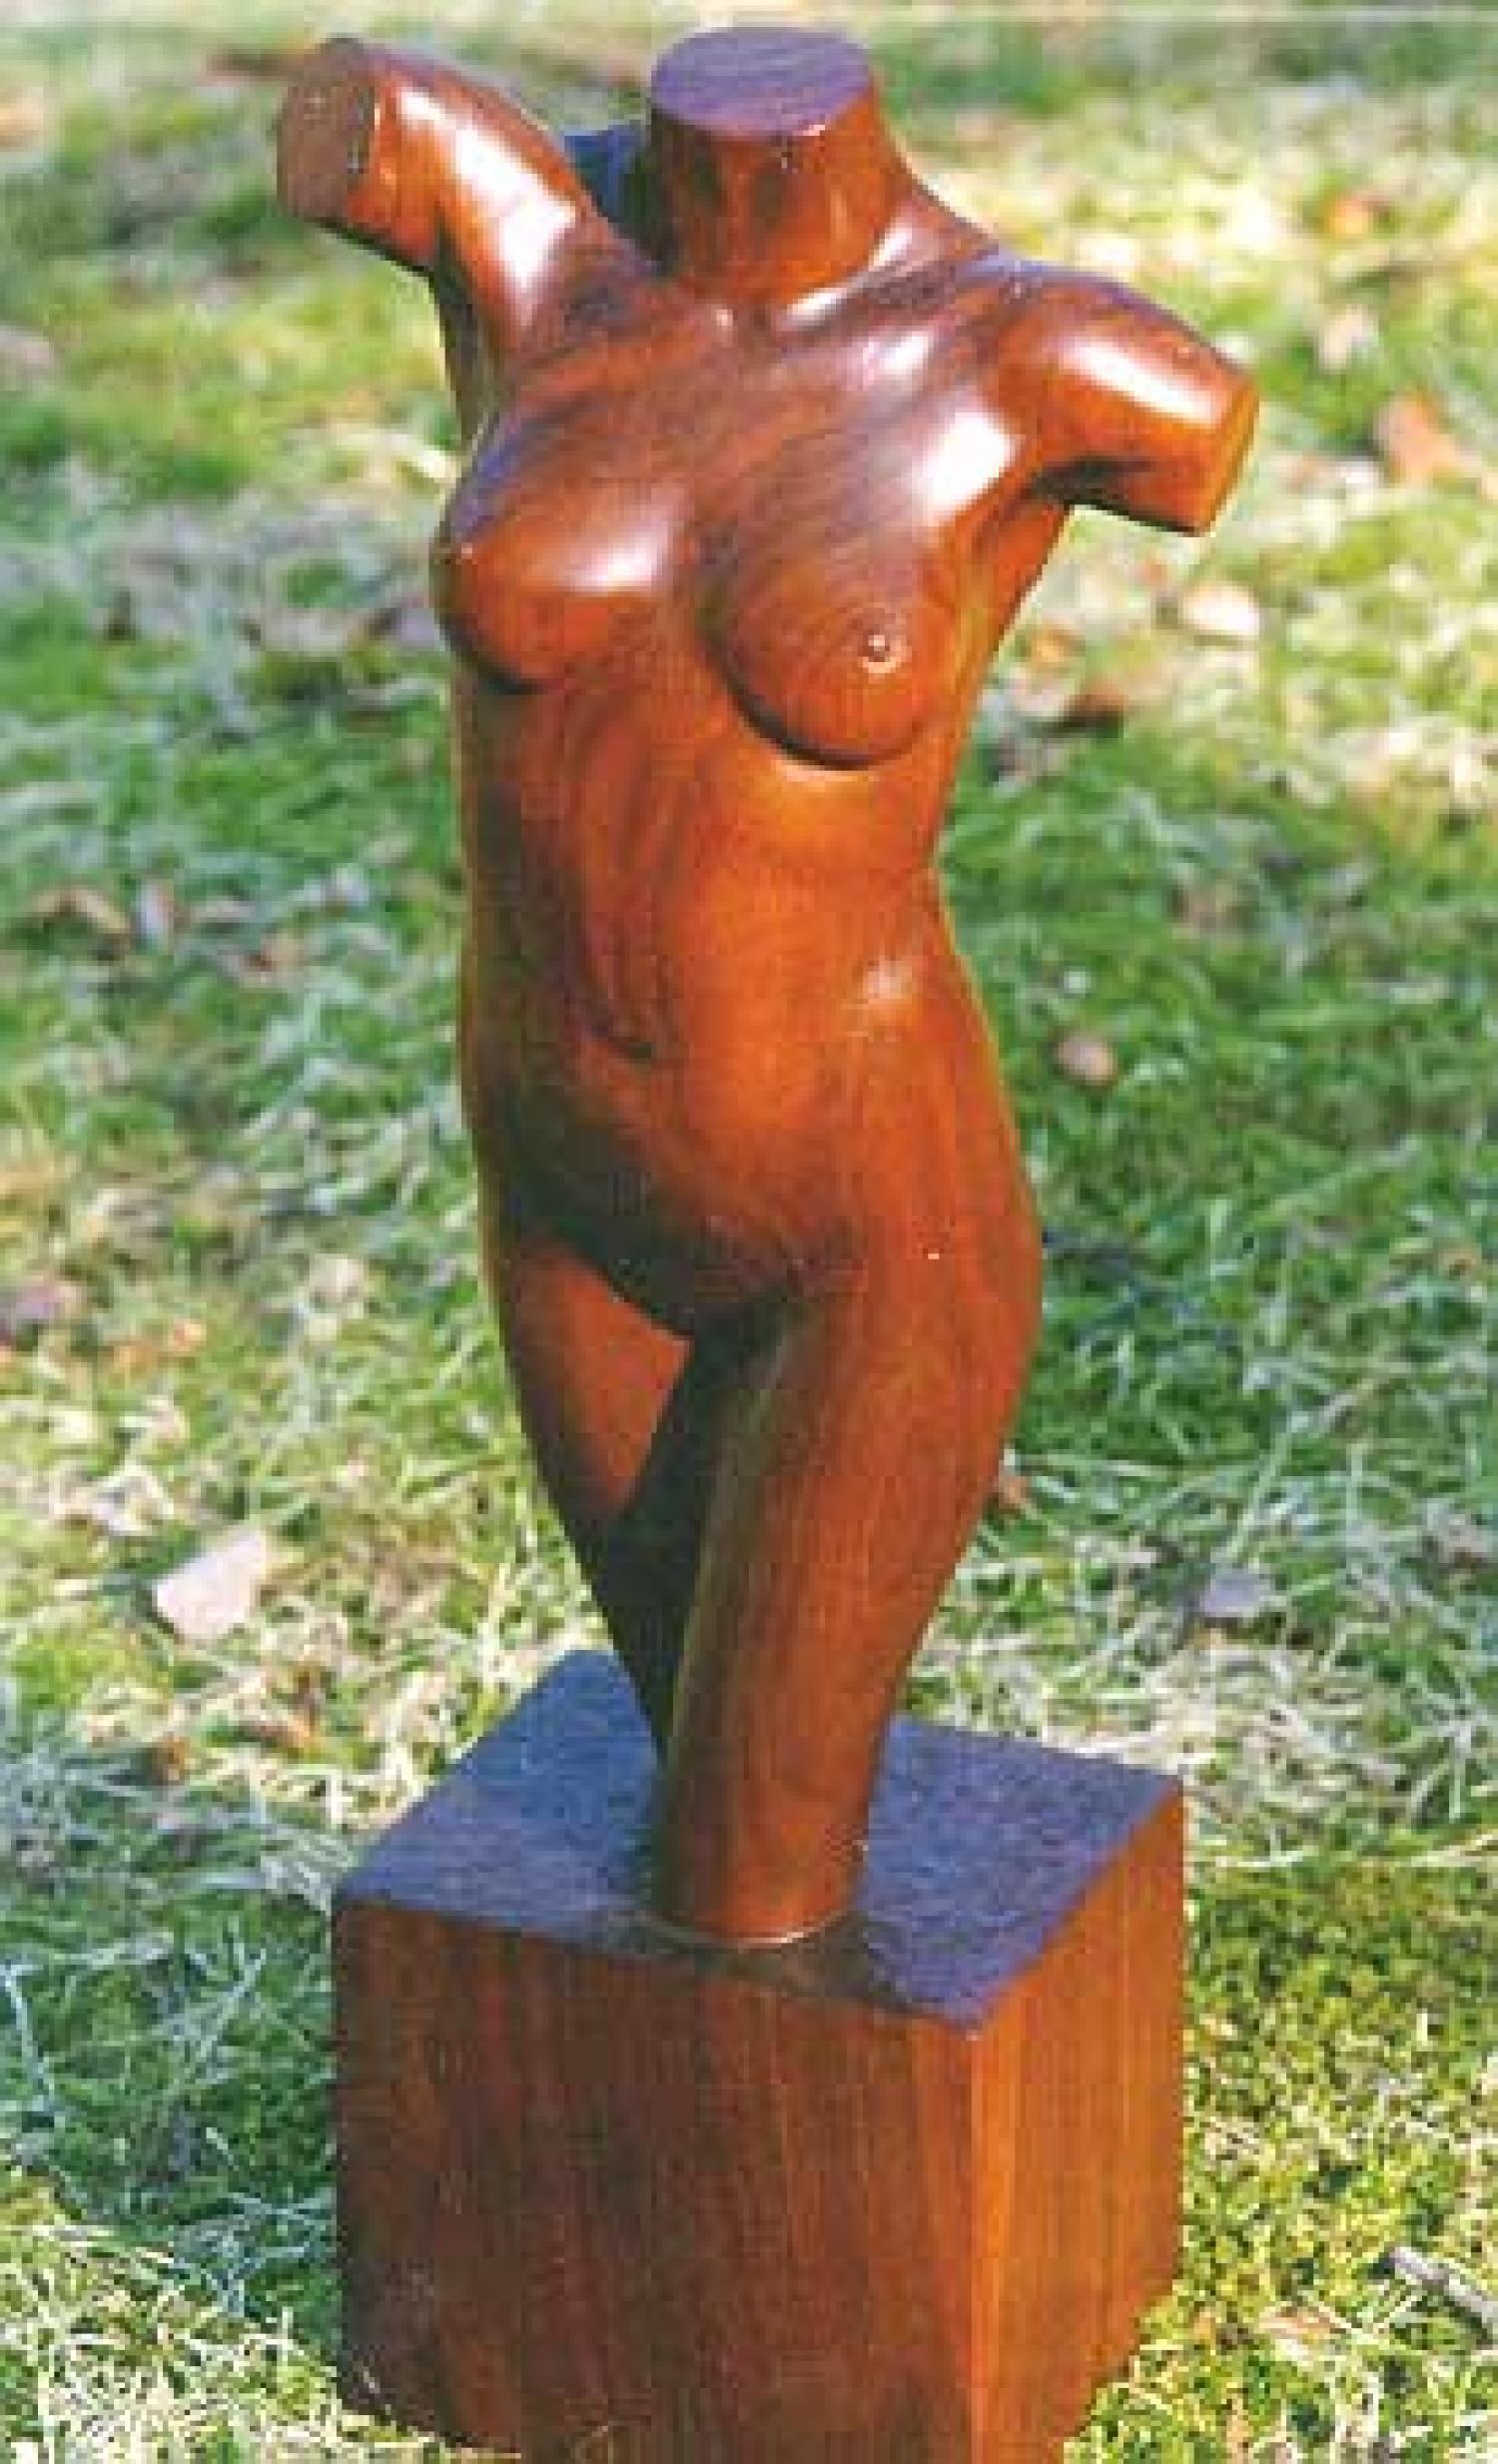 Sculpture nude female torso wood carving